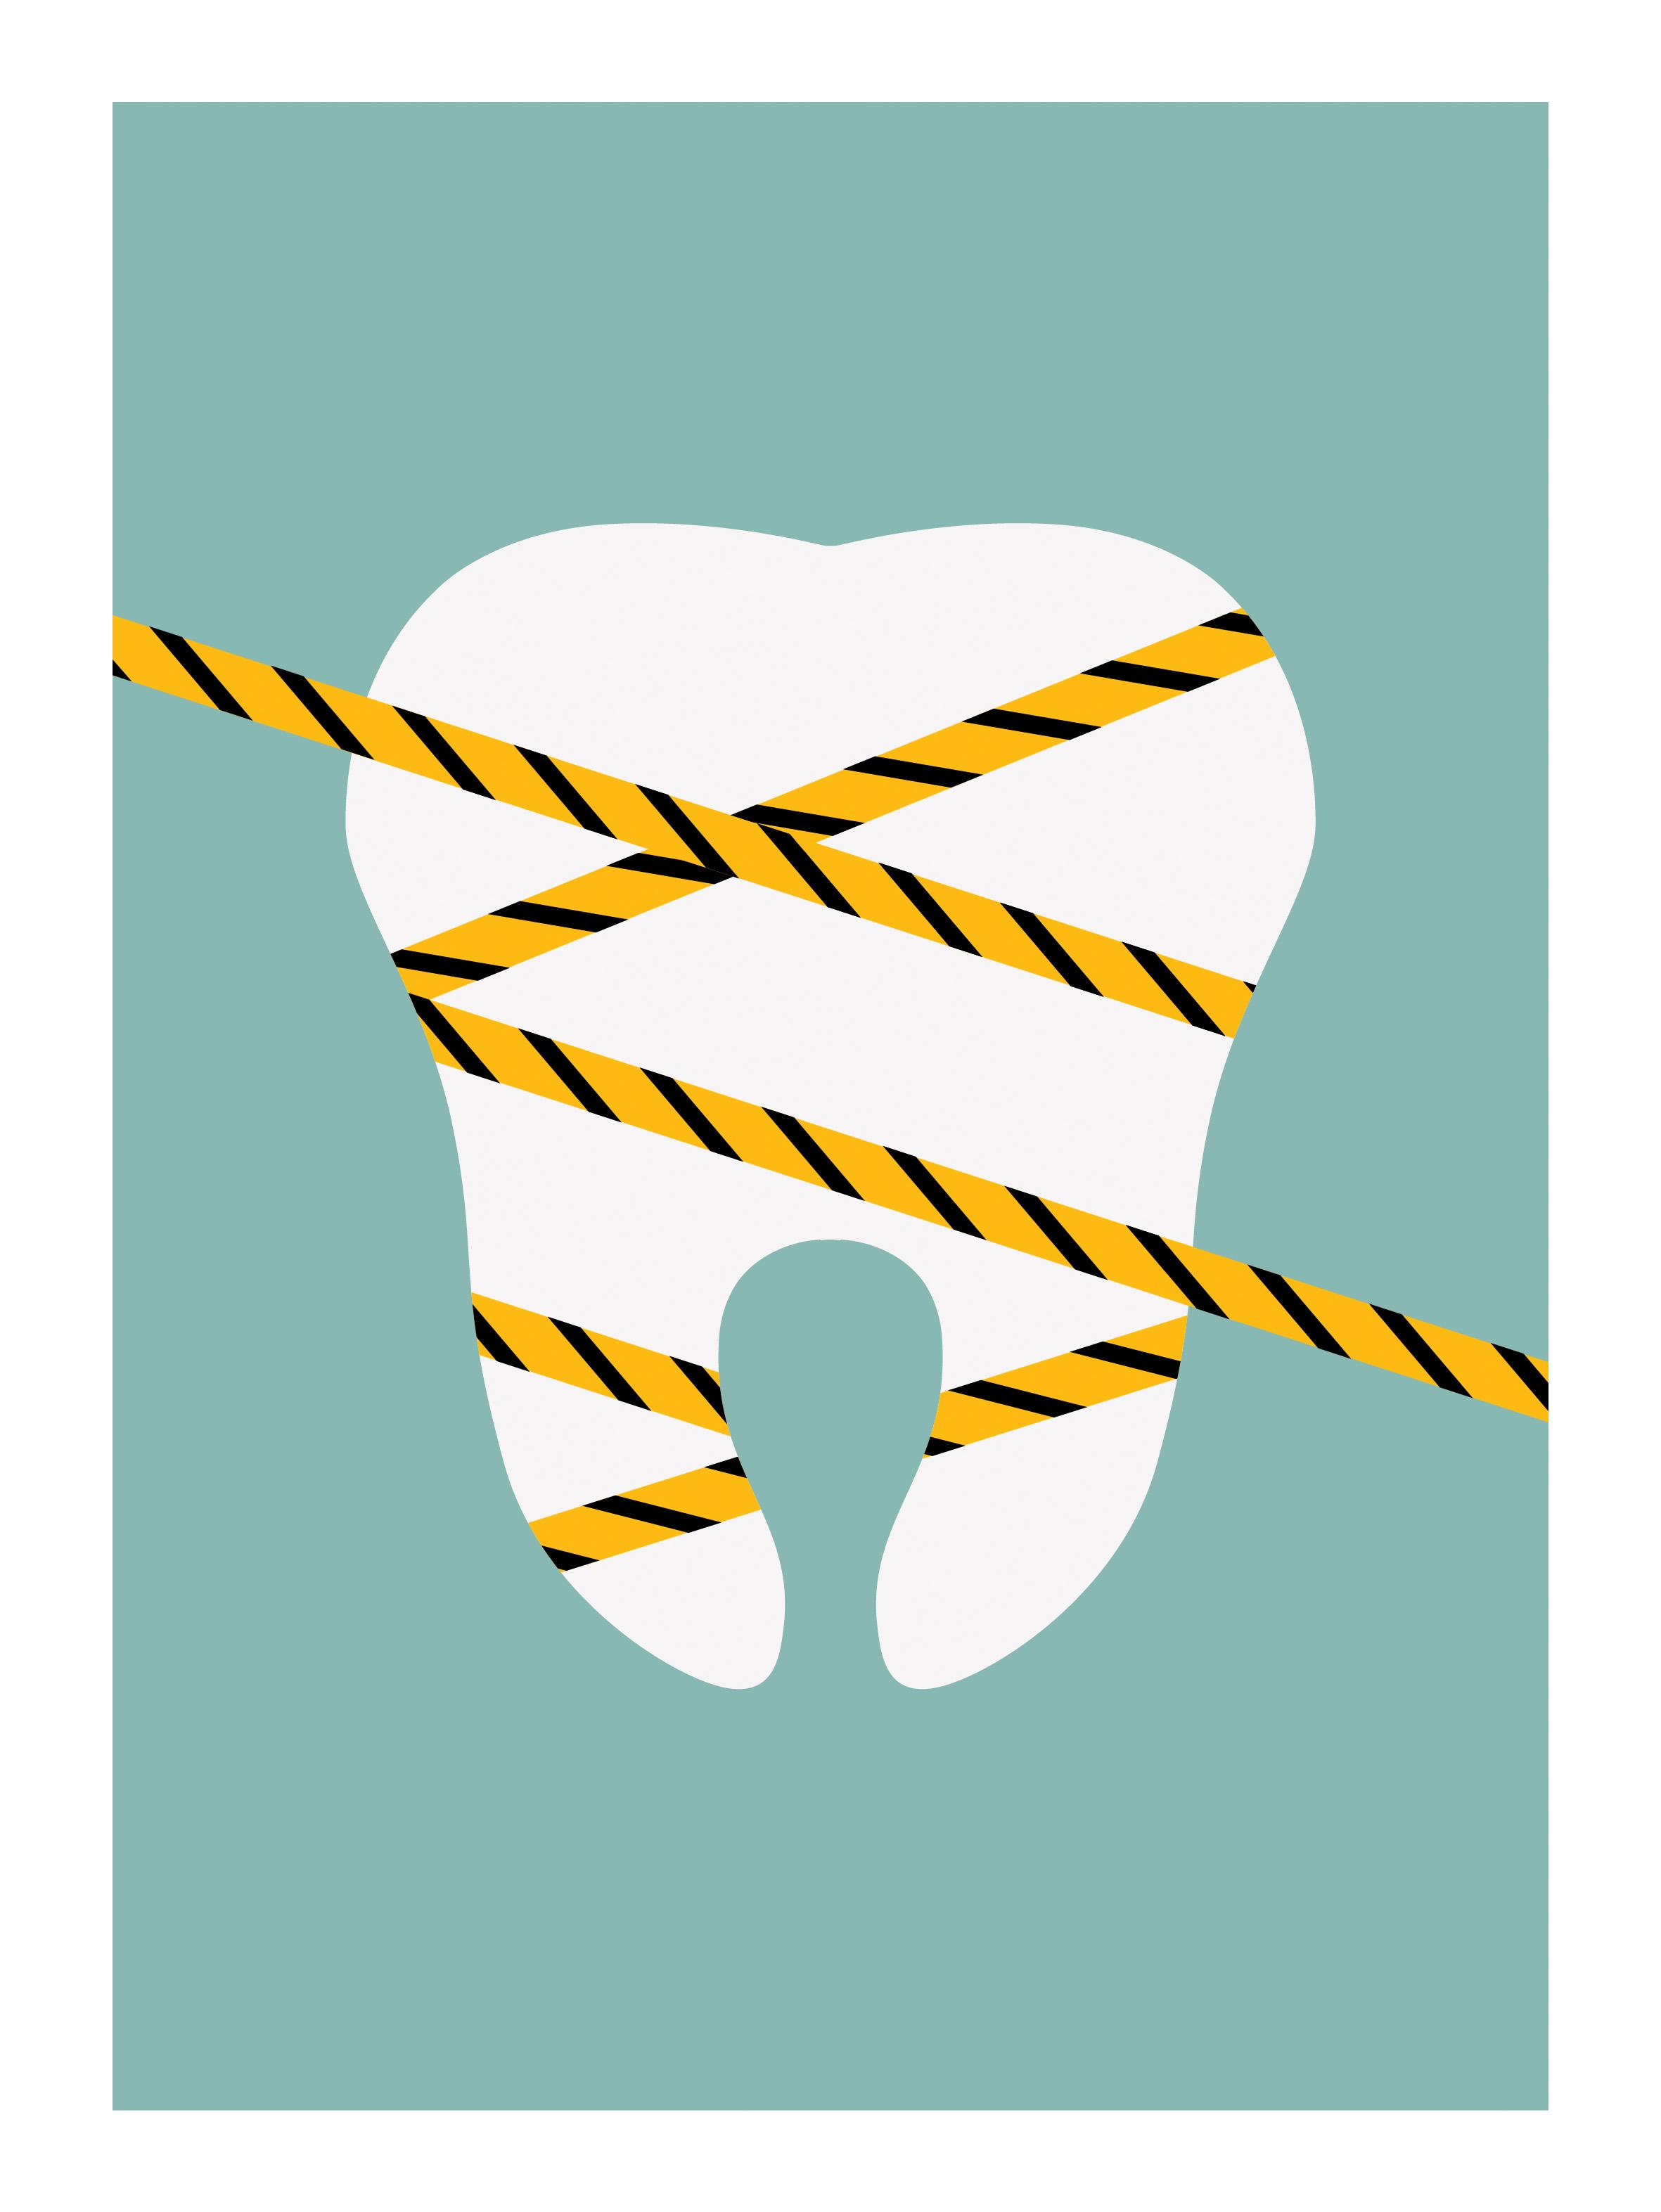 Dentist_illo_colors-01.jpg